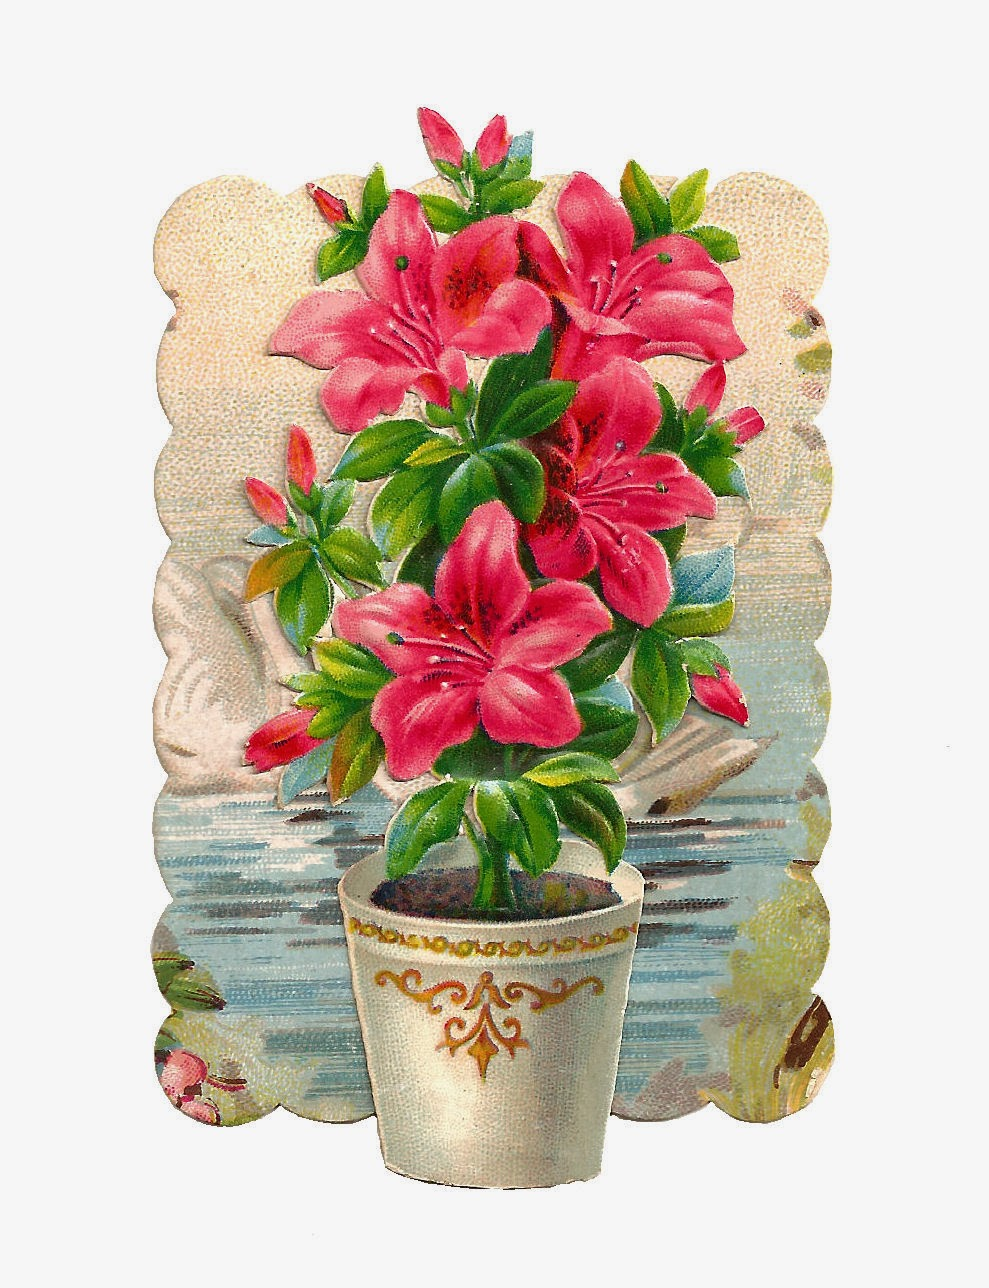 Hibiscus flower clipart image hibiscus flower - Free Flower Clip Art Pink Hibiscus Flowers In White Pot Digital Scrap